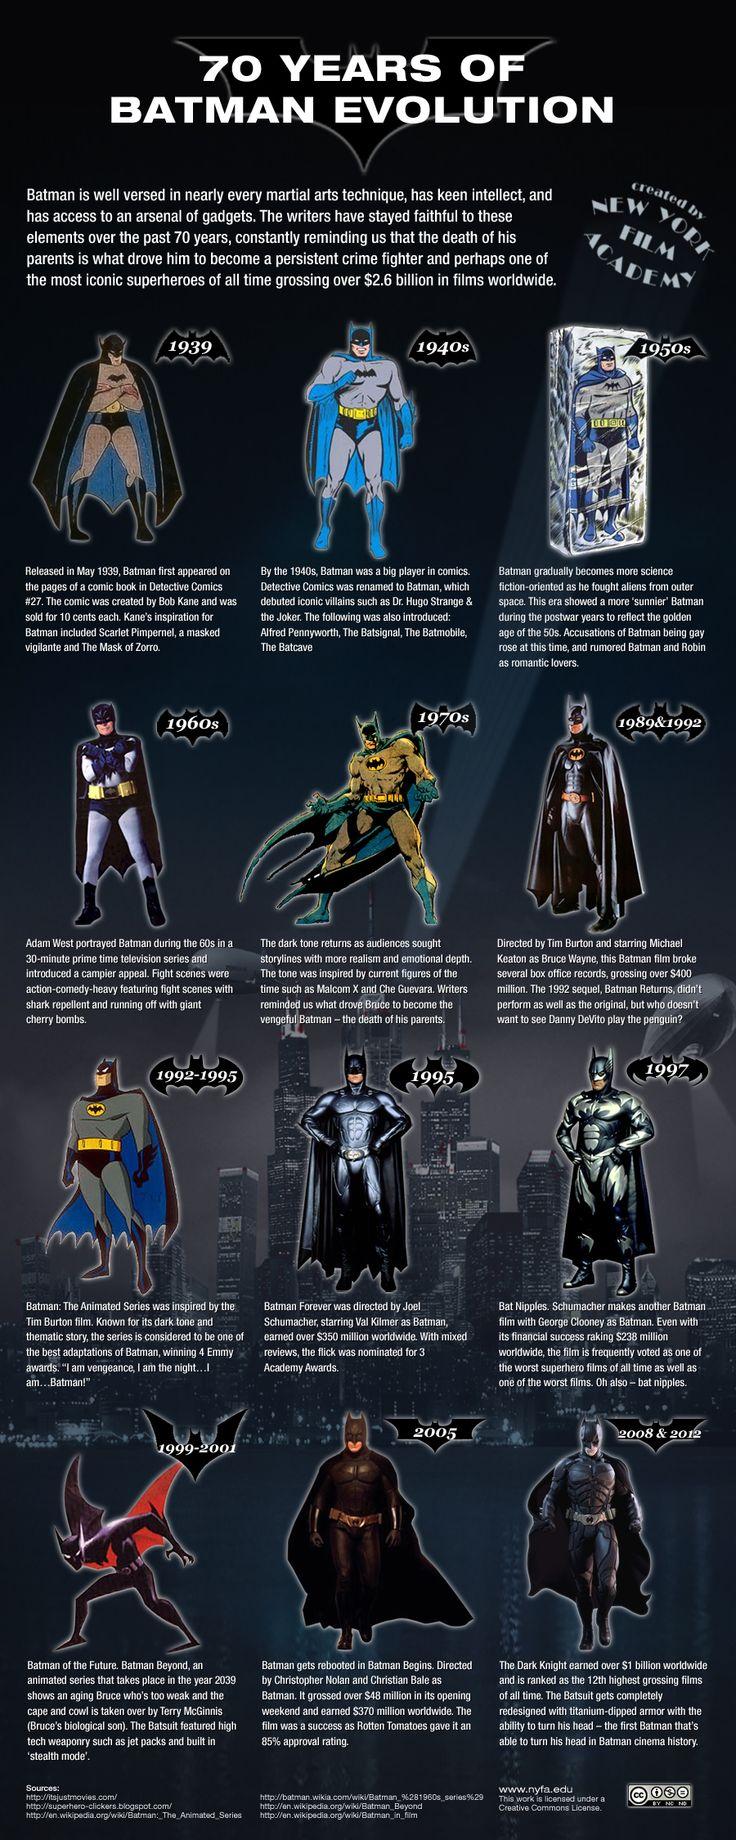 The evolution of #Batman a que no adivinais de quién me acabo de acordar? pistas para @BELEN GONZALEZ y @Joaquin Nuñez  ^_^